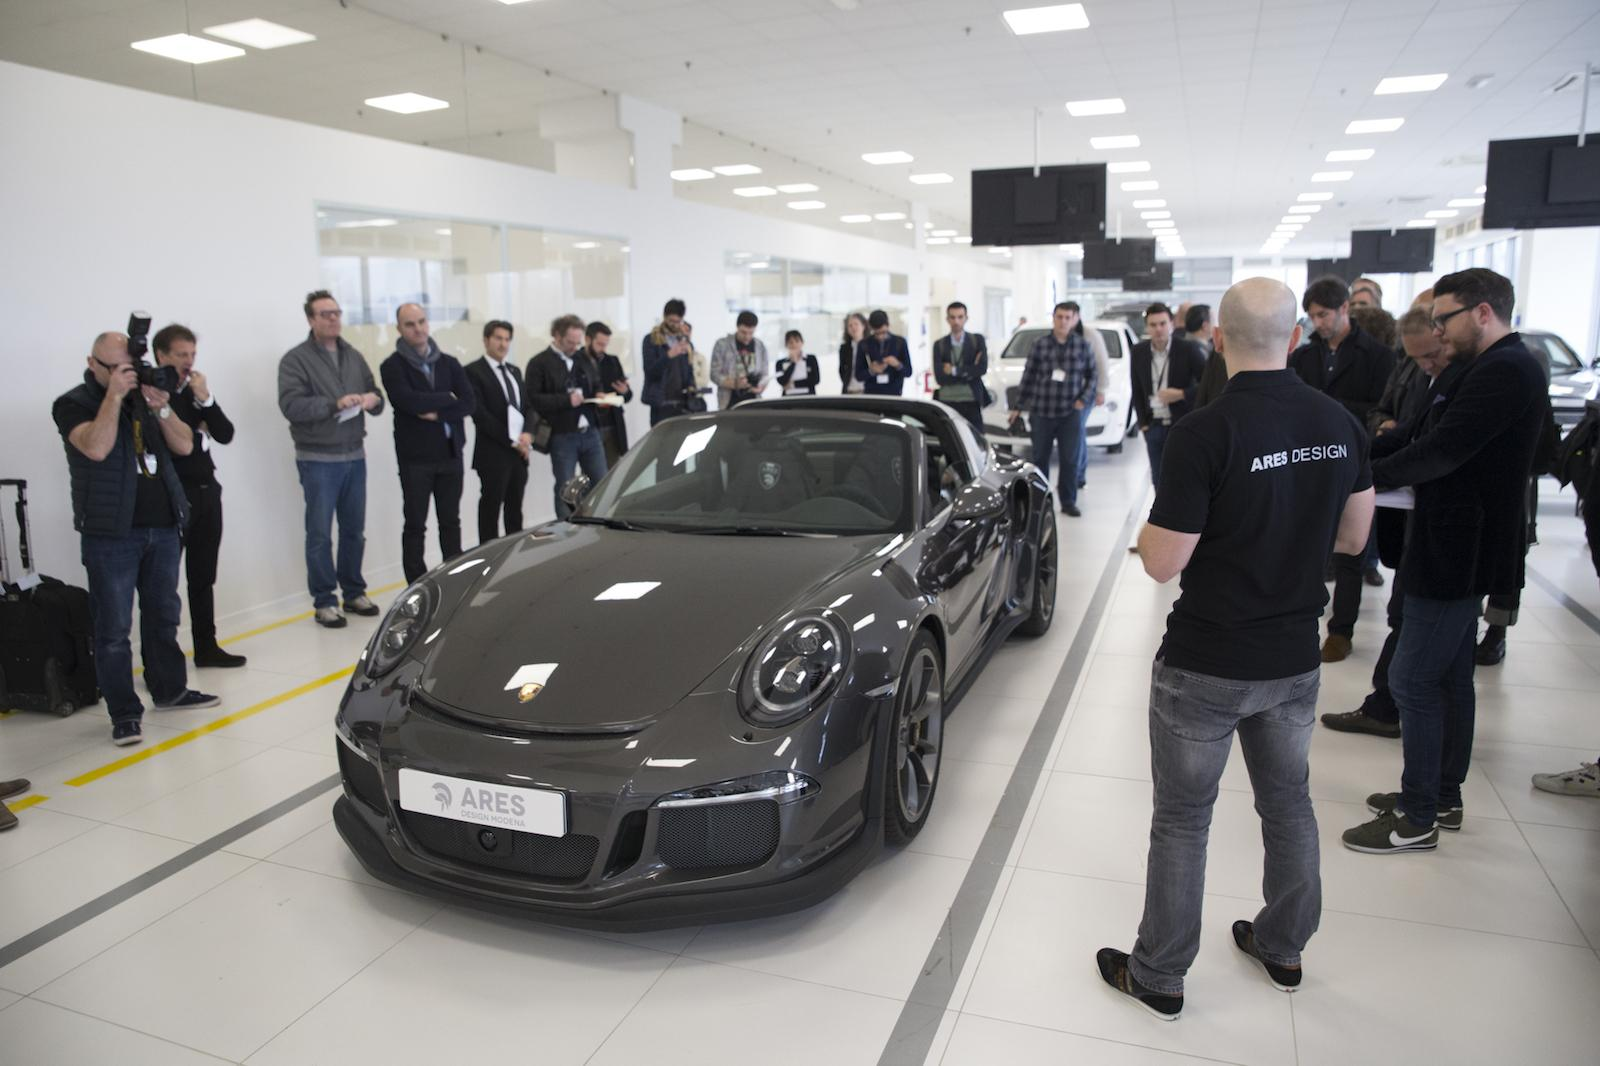 Dany Bahar: new champion of the bespoke car world?